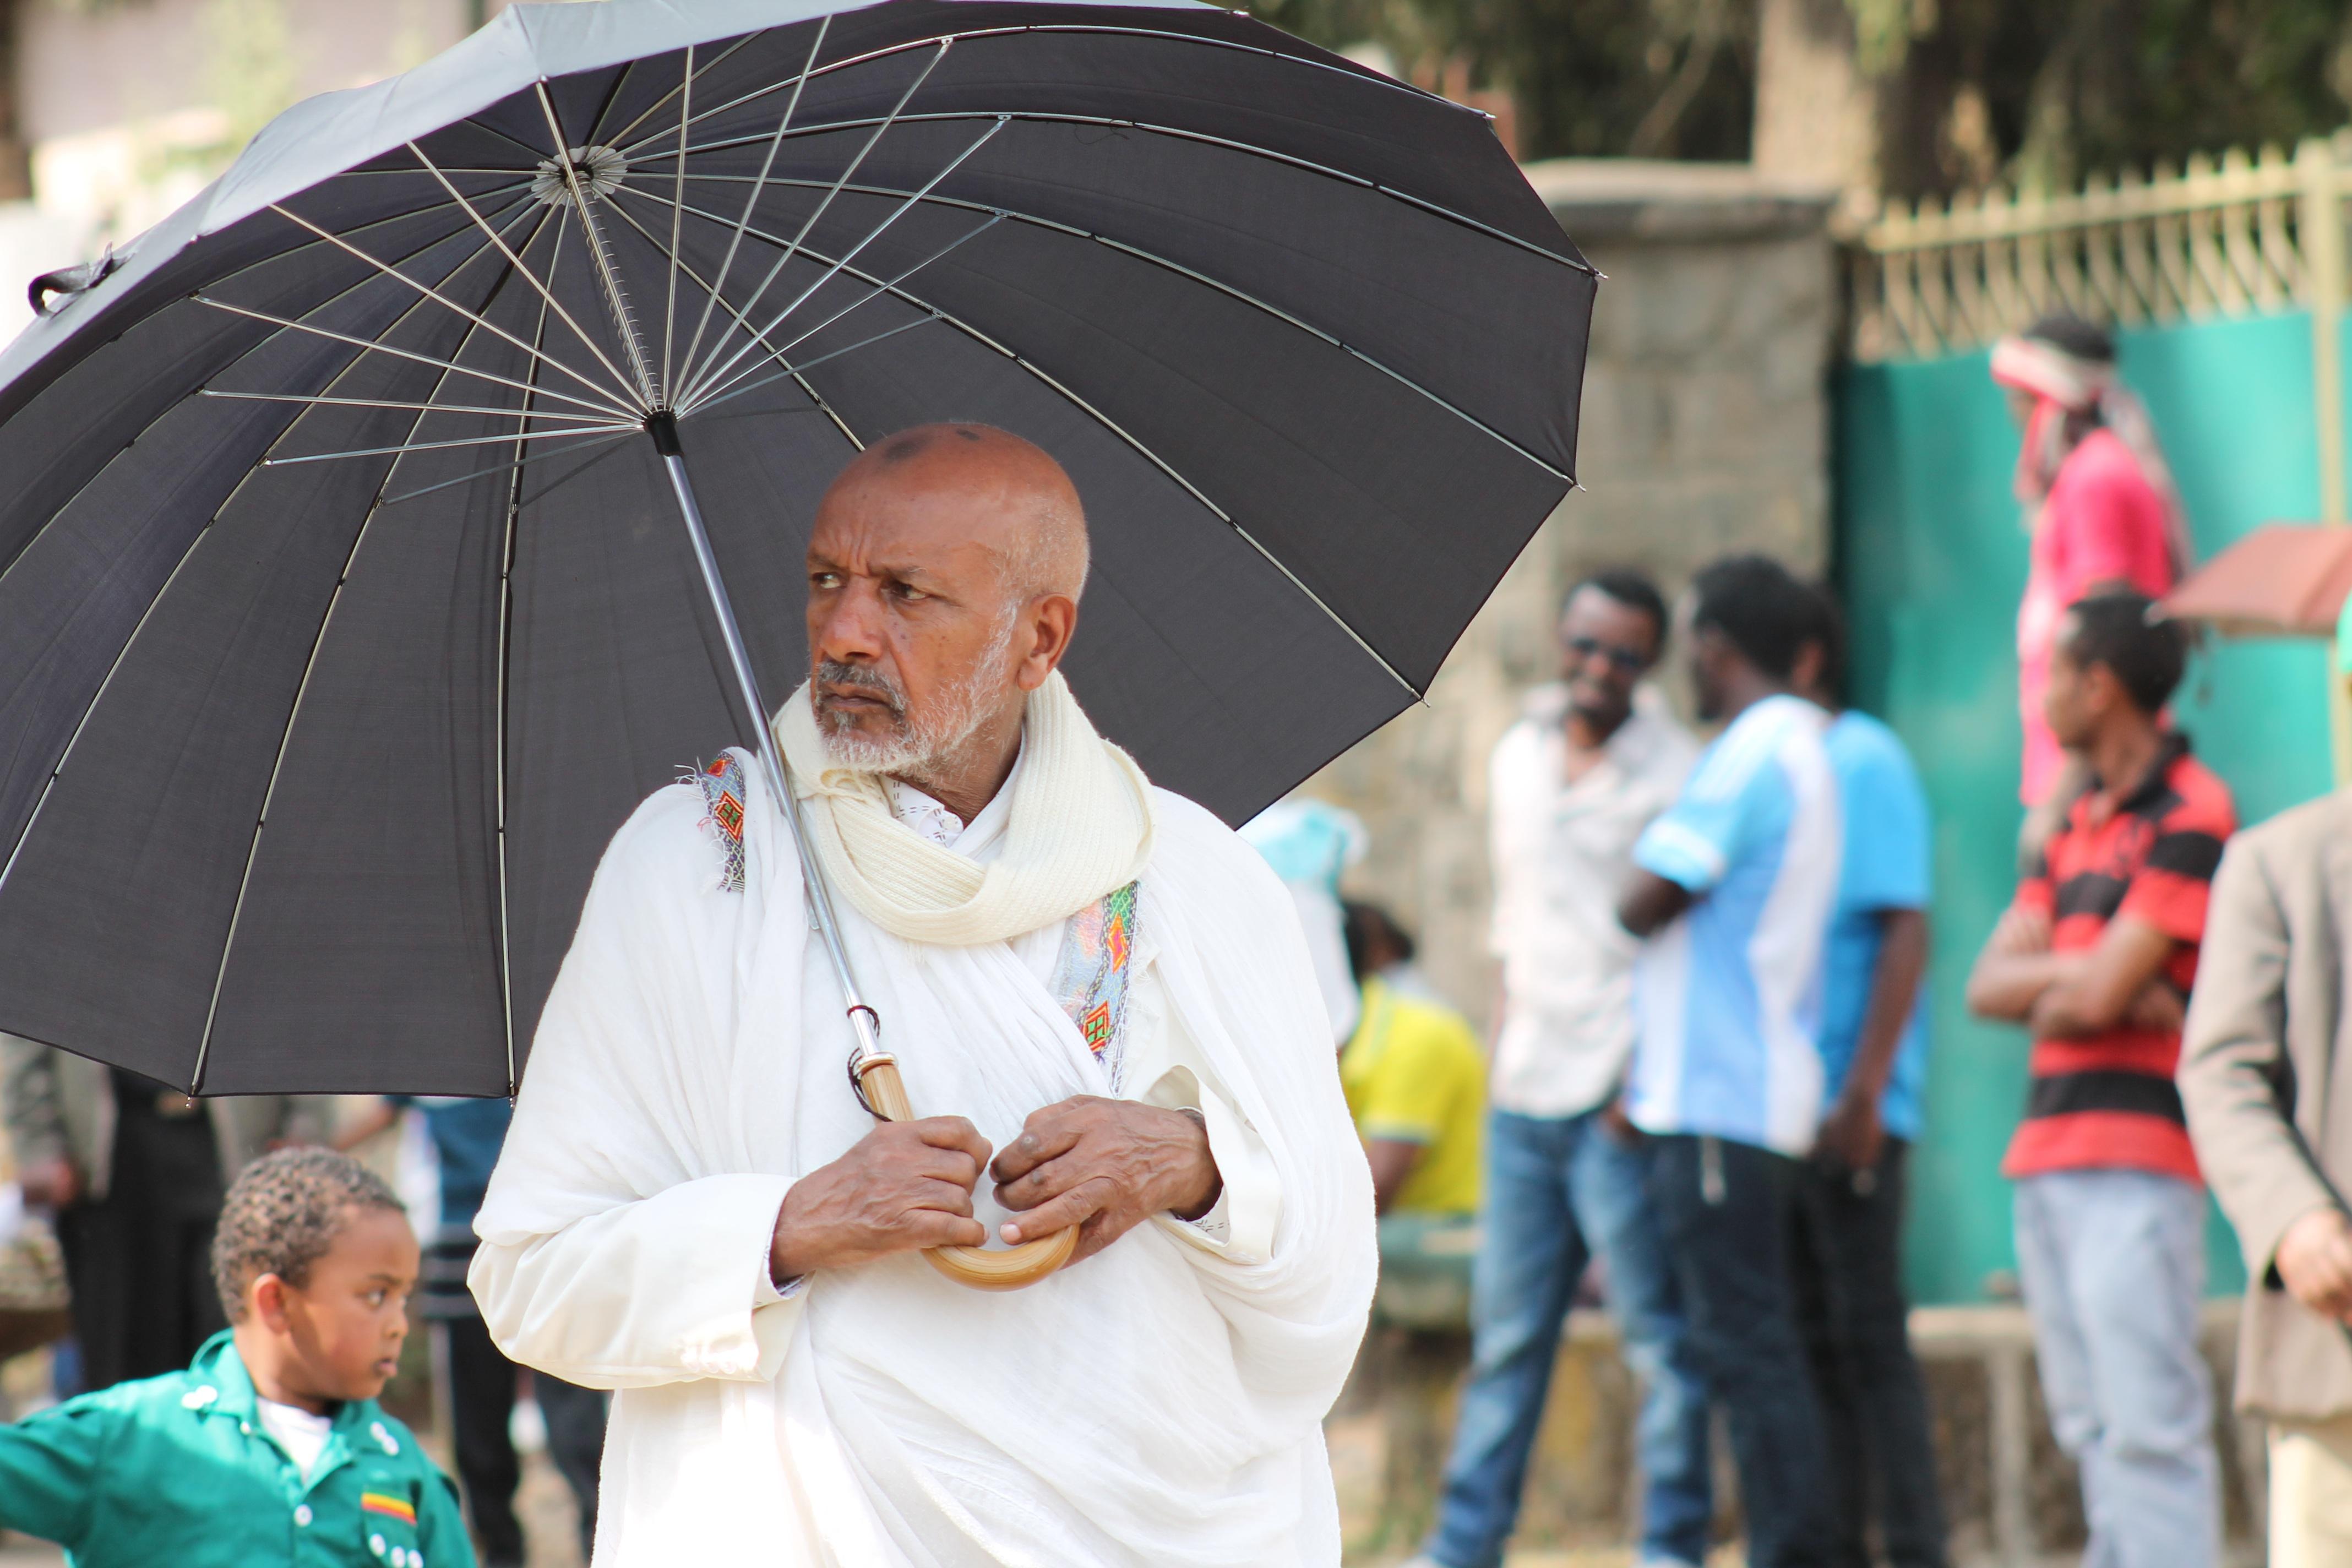 dating etiopiske manndating en fyr med penger problemer